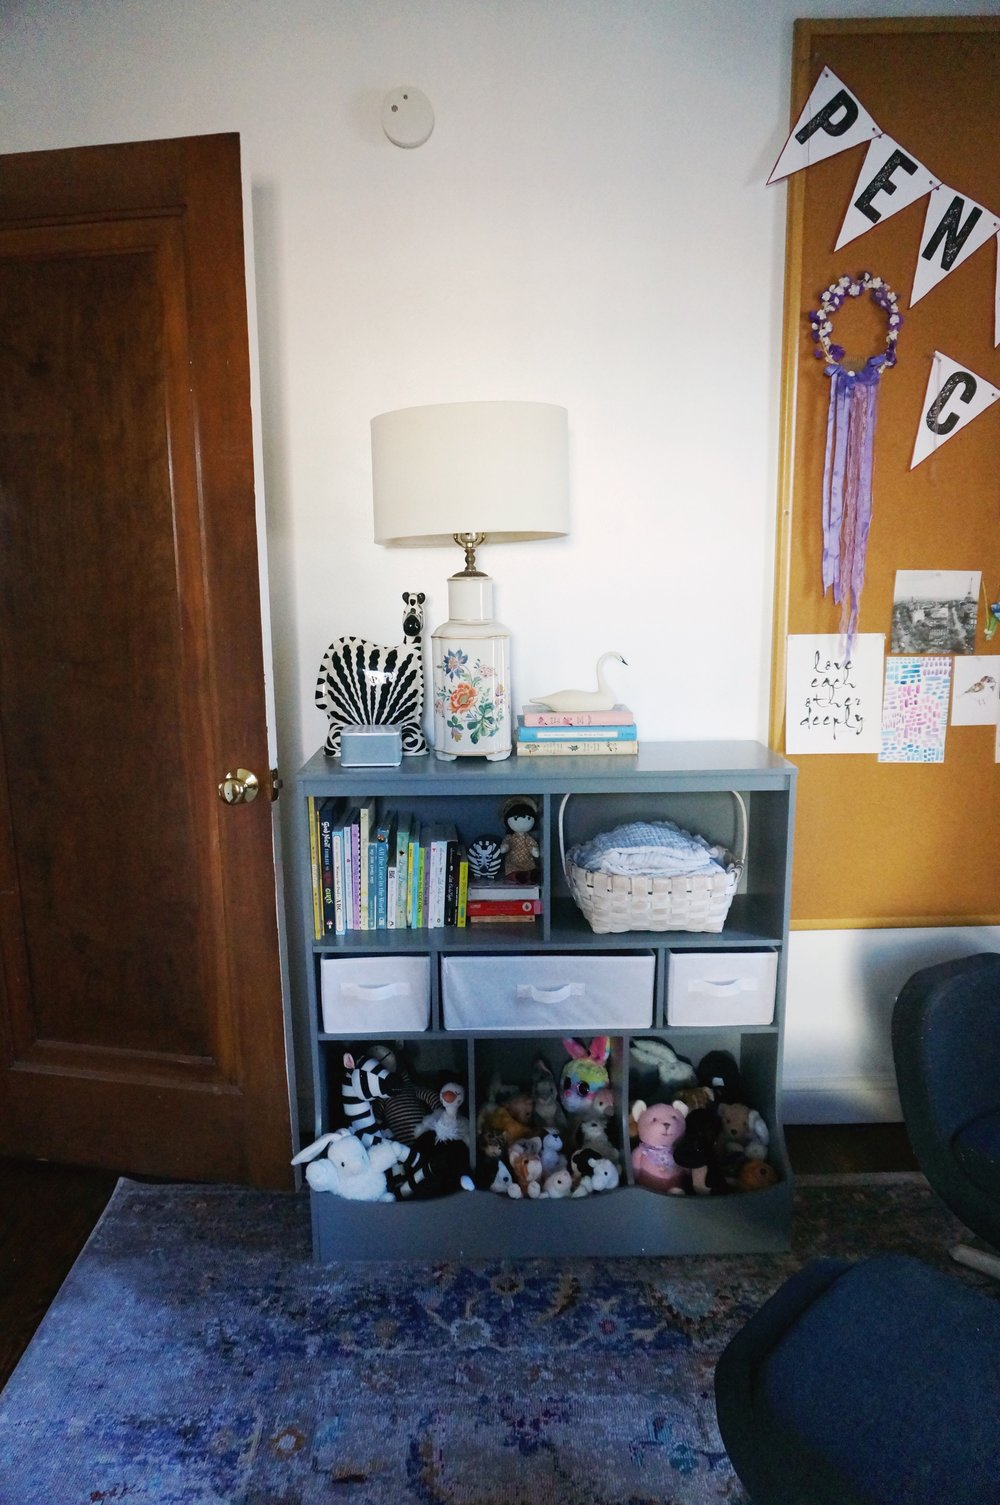 Penelope's Nursery (Book + Toy Storage) | Cassia & Co.